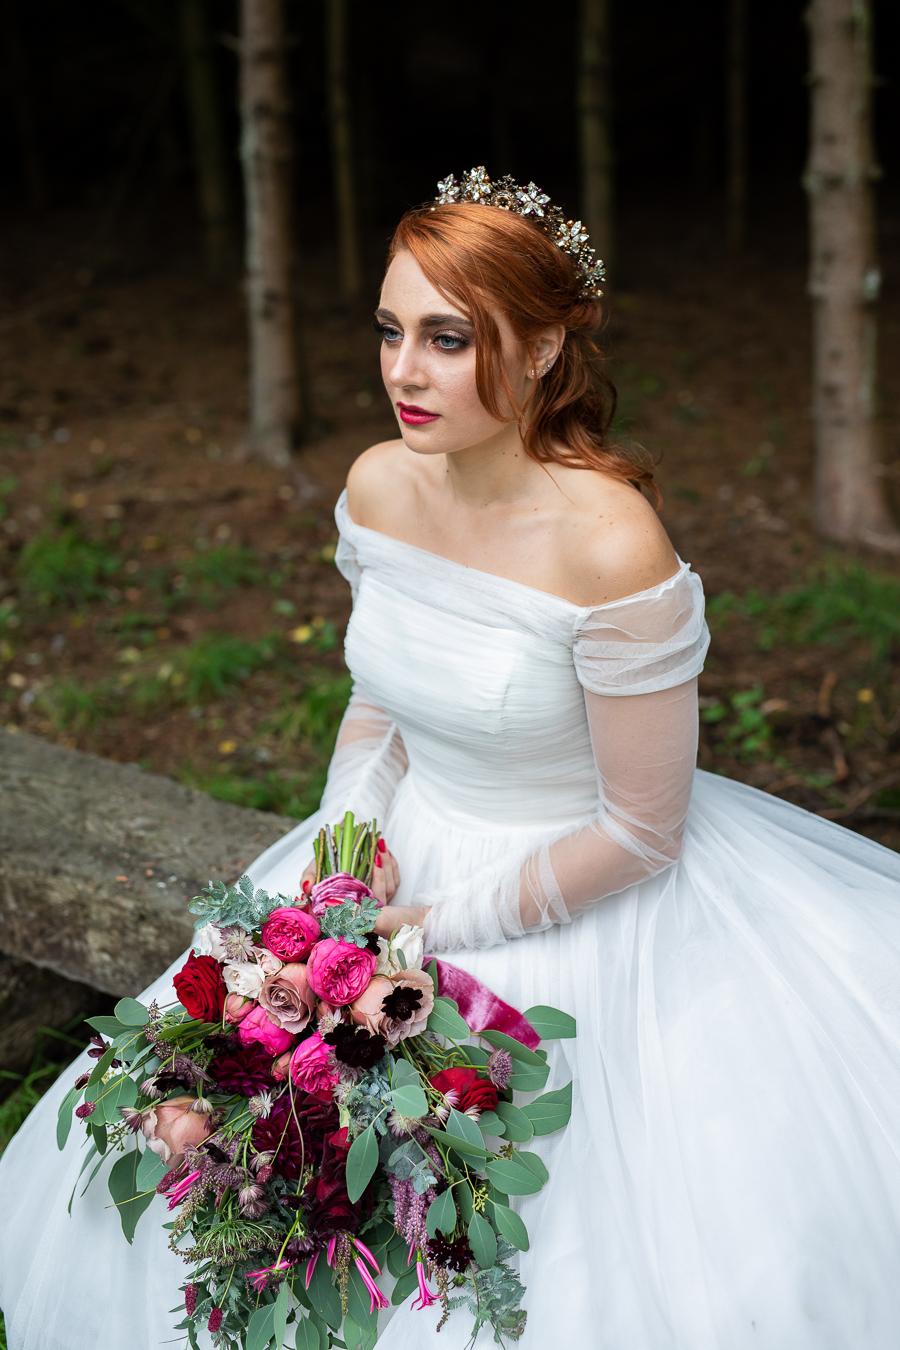 Winter woodland wedding styling ideas, image credit Photography by Chantel (28)